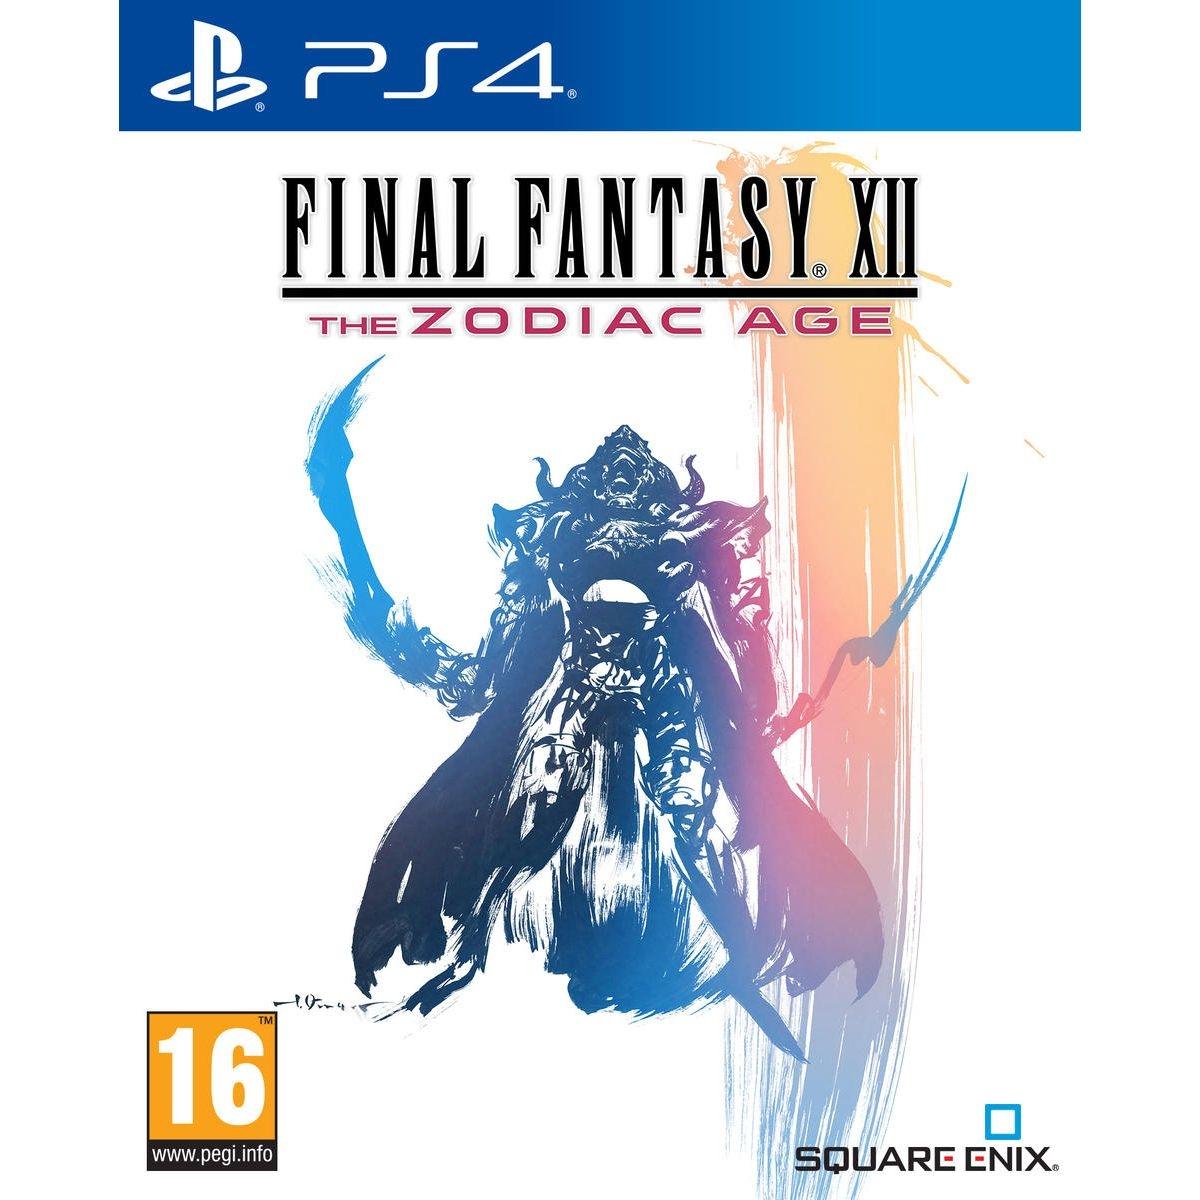 Final Fantasy XII : The Zodiac Age PS4